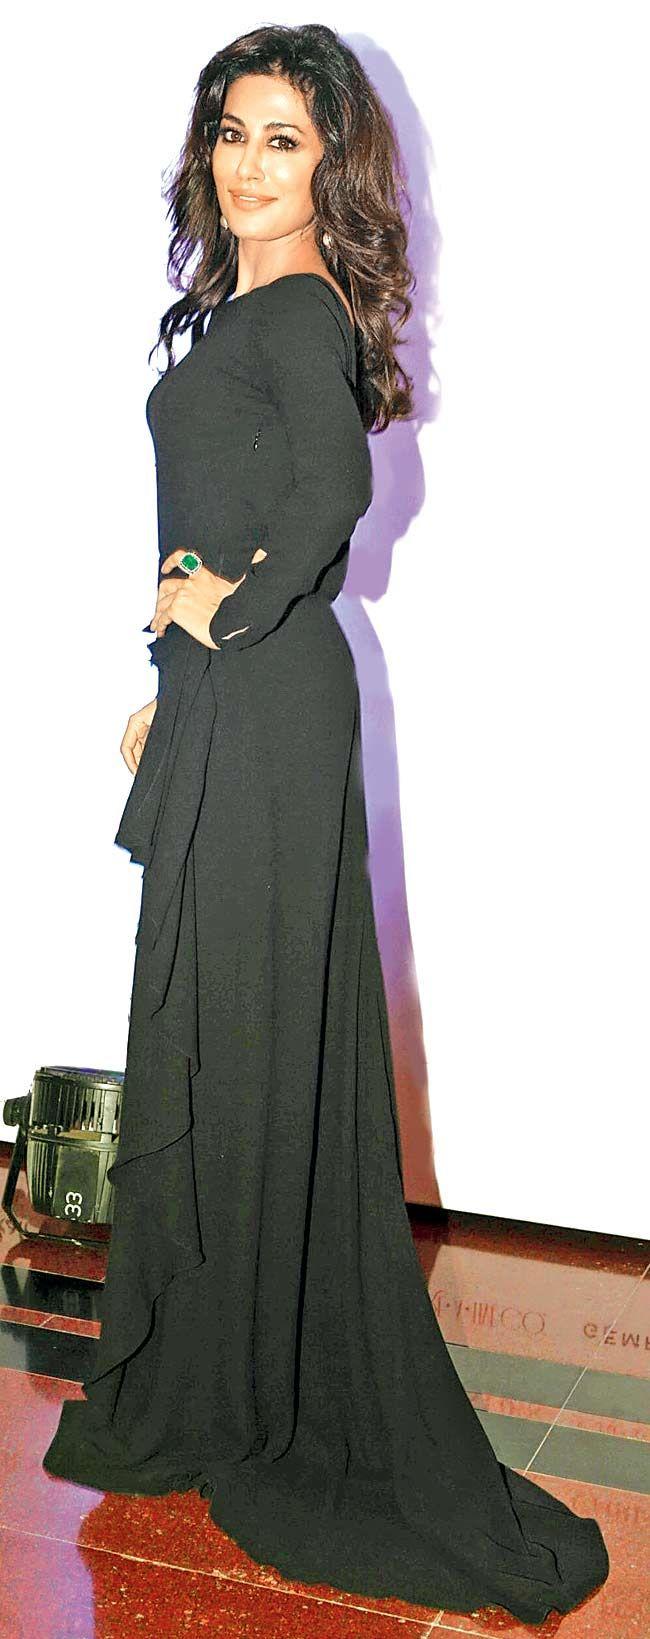 Chitrangada Singh at a jewellery auction. #Style #Bollywood #Fashion #Beauty